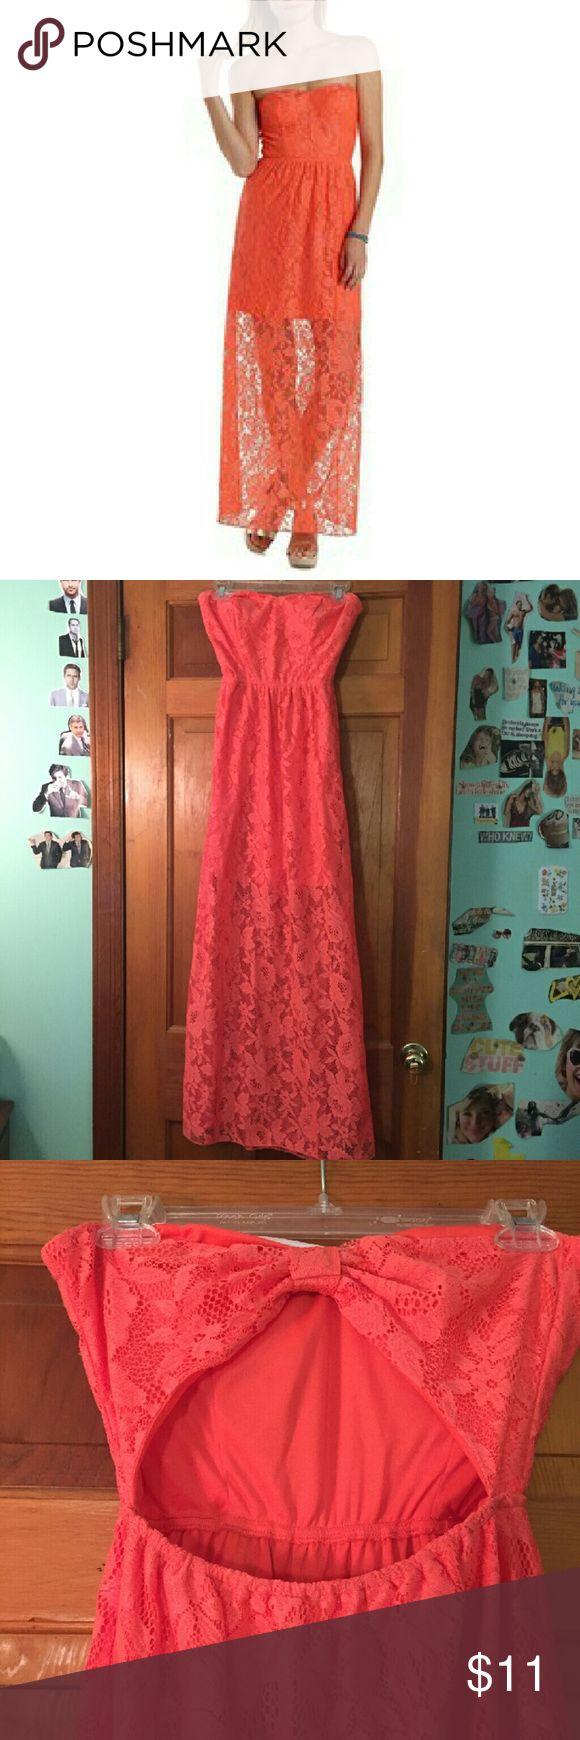 Lana lace maxi dress orange